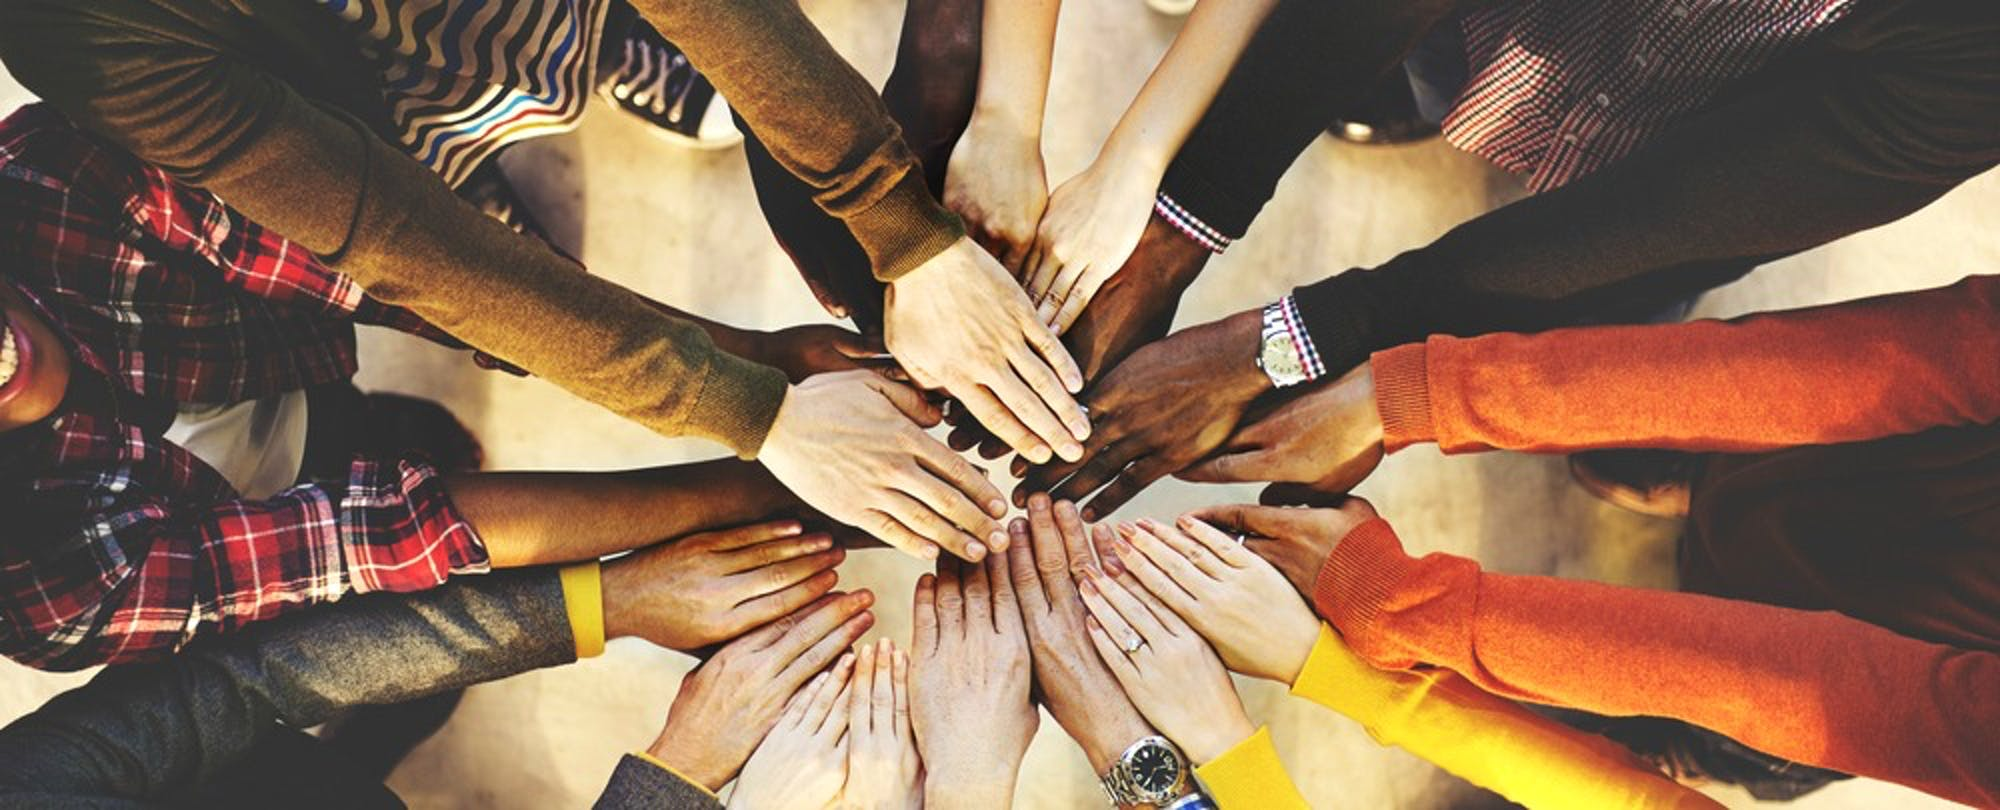 Online Classes Get a Missing Piece: Teamwork